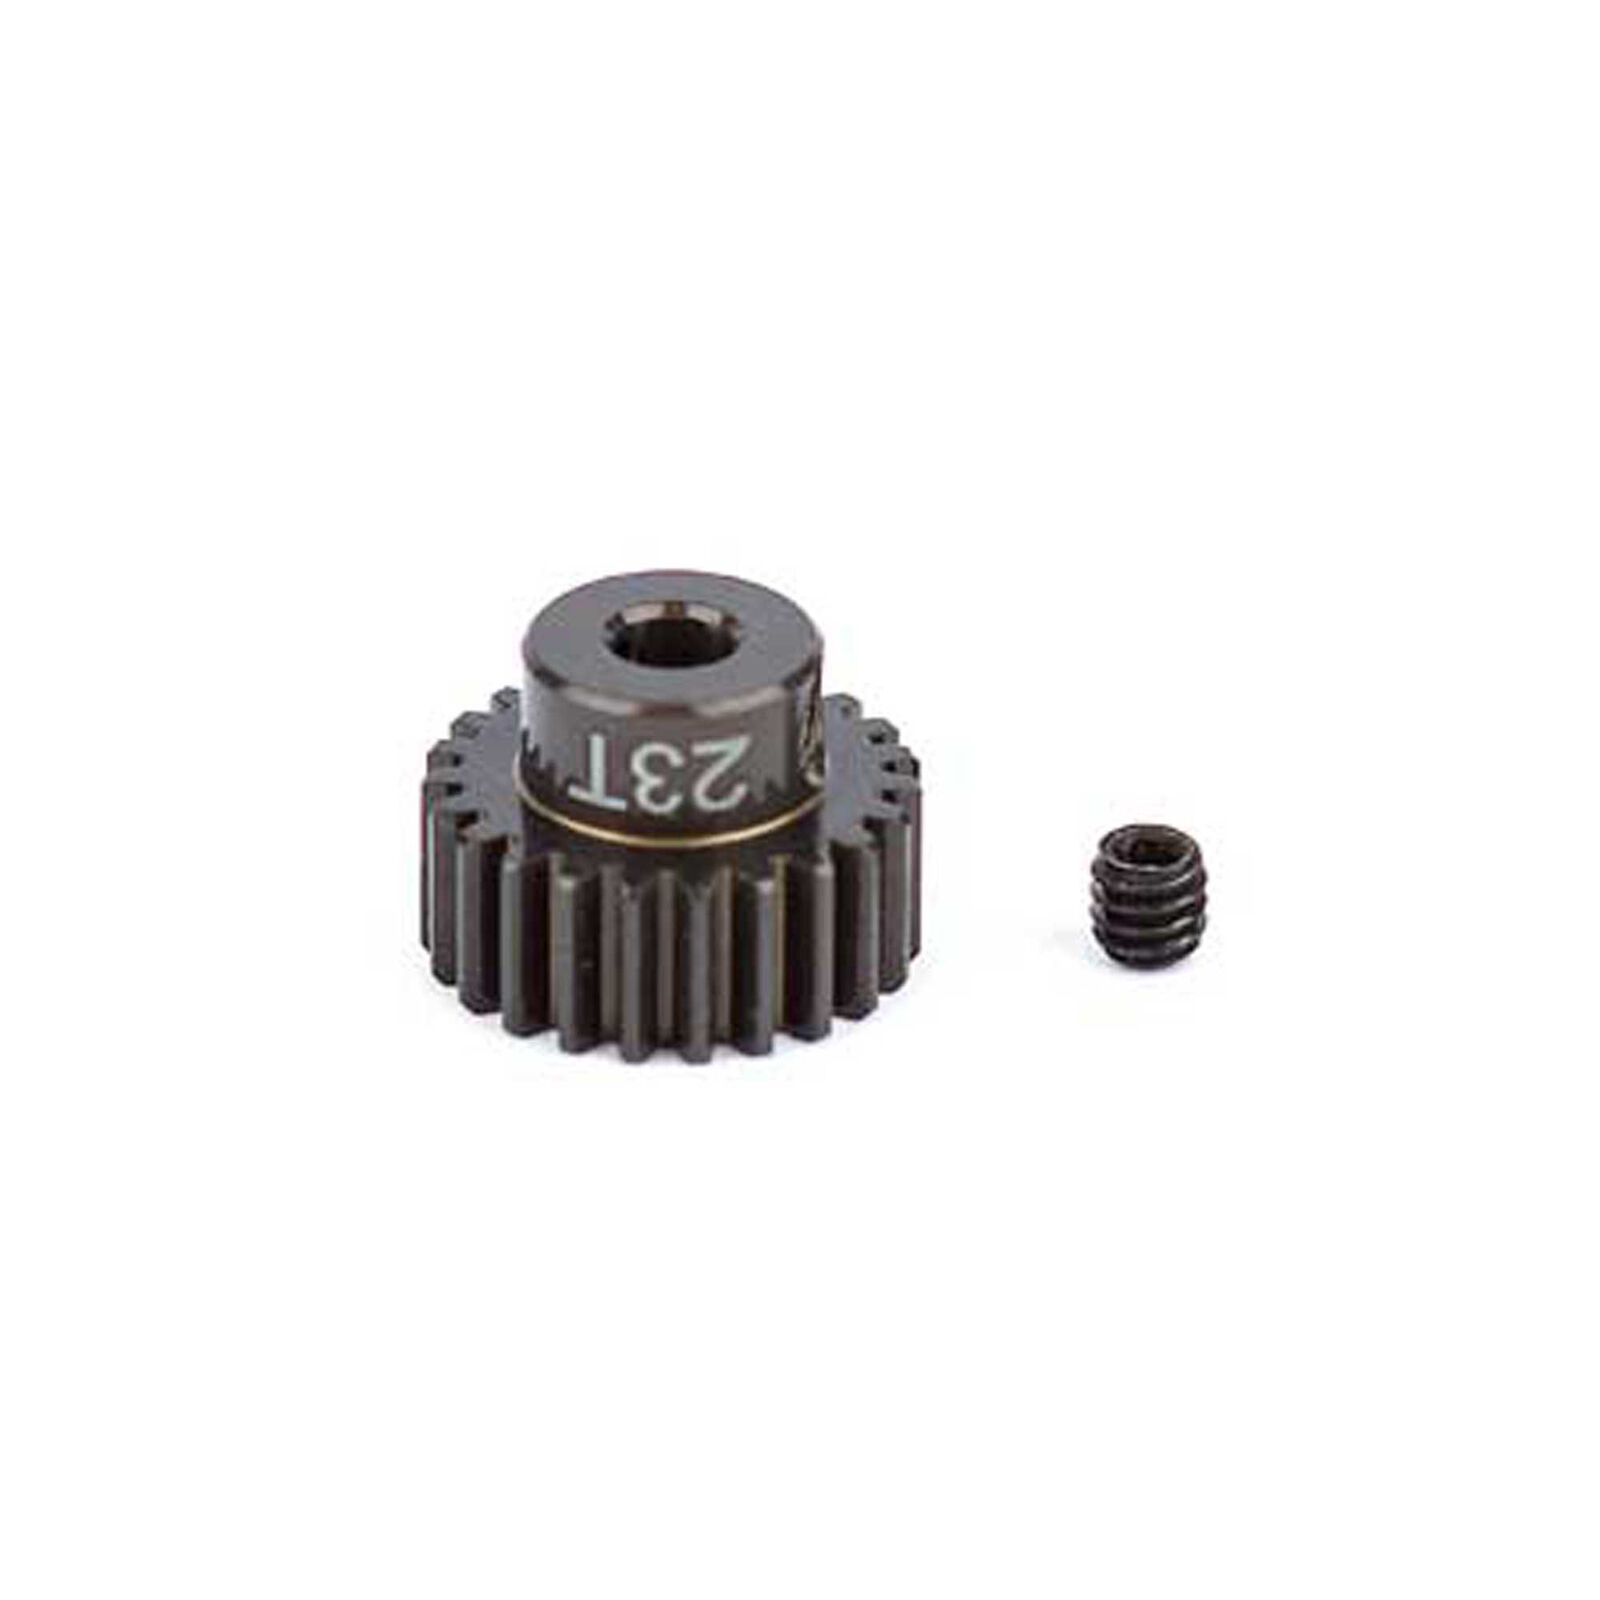 Factory Team Aluminum Pinion Gear, 23T, 48P, 1/8 shaft